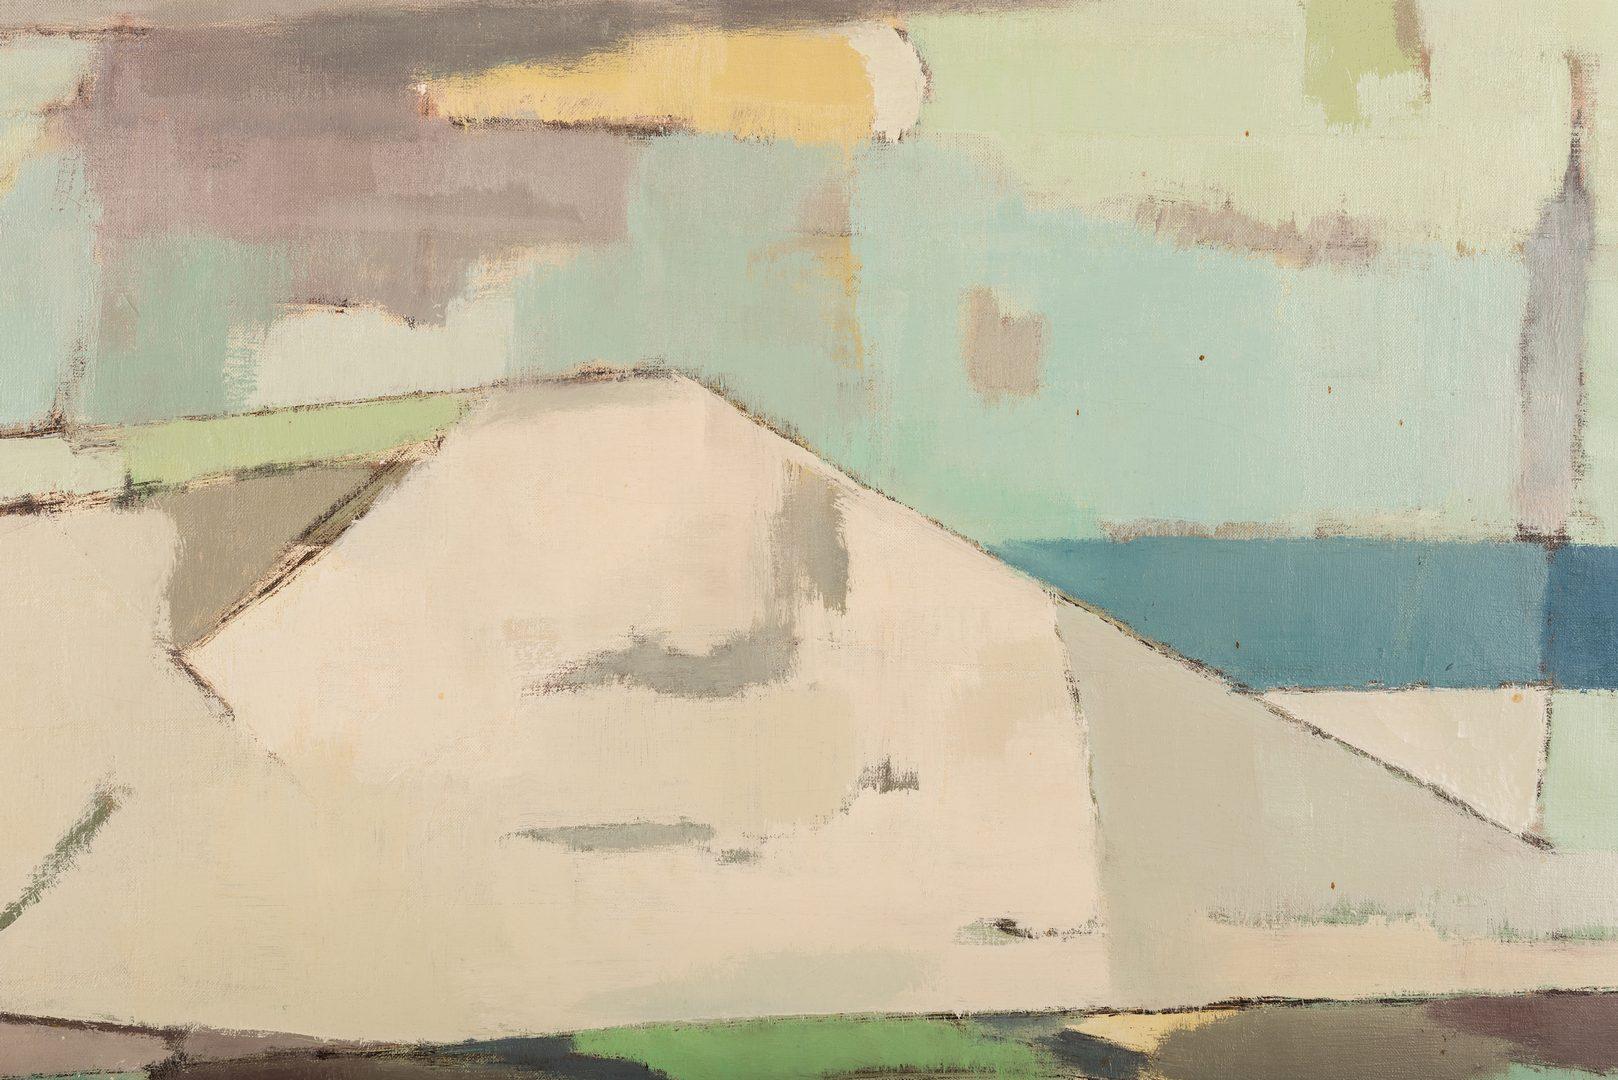 Lot 116: George Cress O/B, Cubist Beach Scene